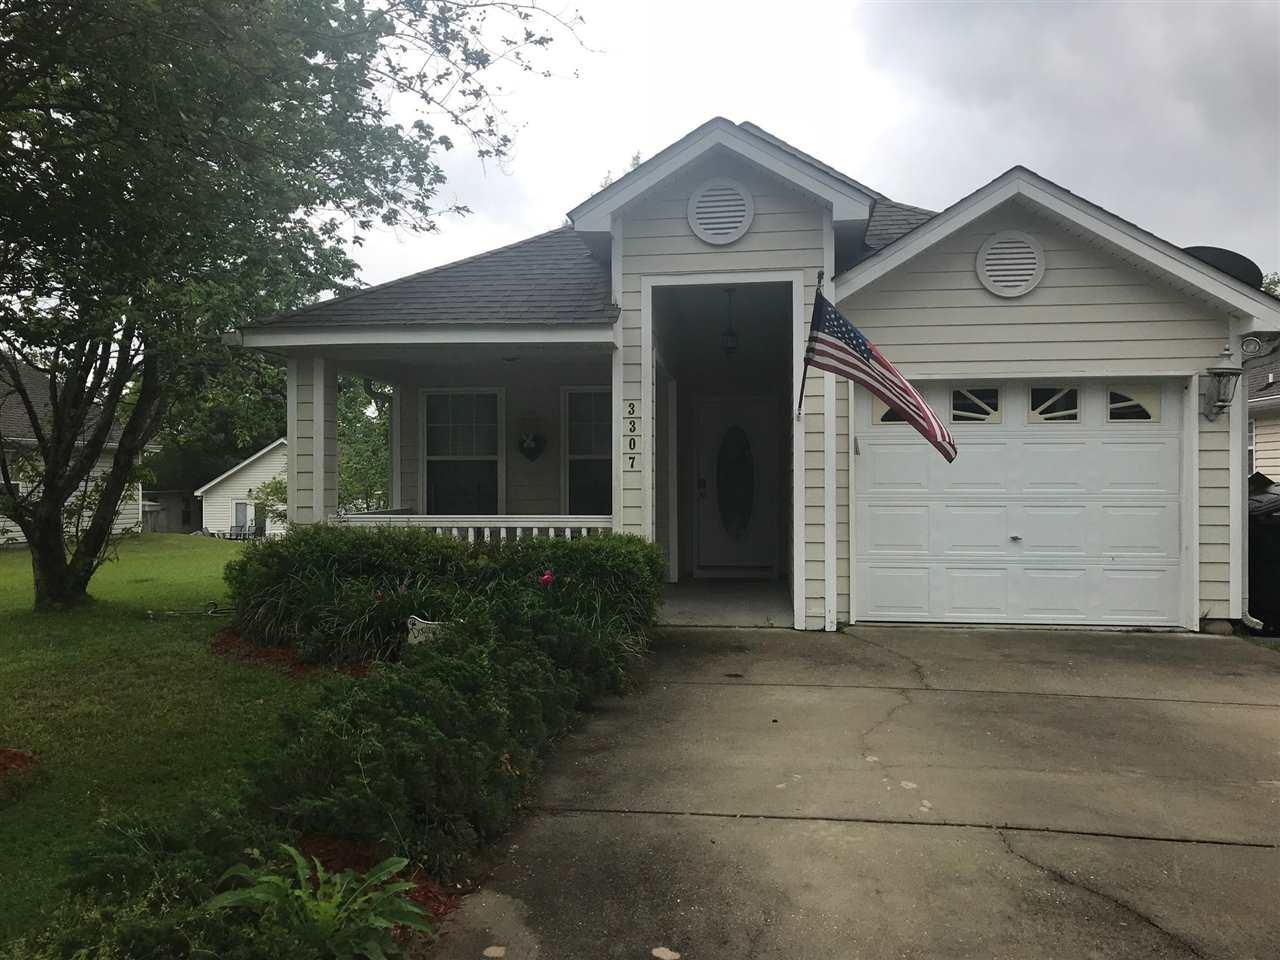 Property ID 292241